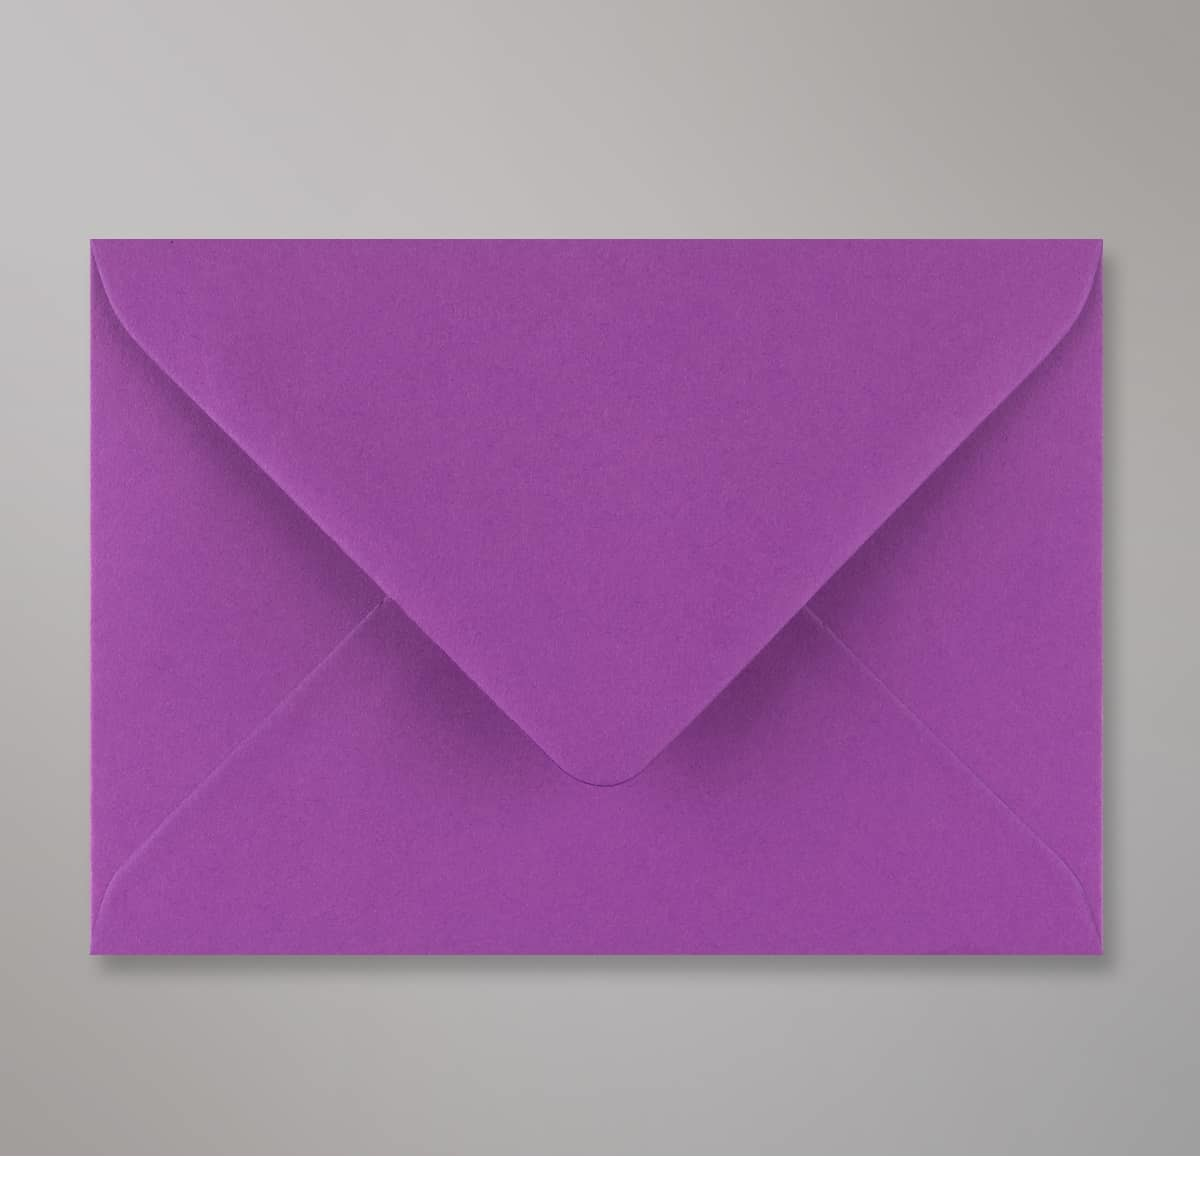 Enveloppe violette 114x162 mm (C6)